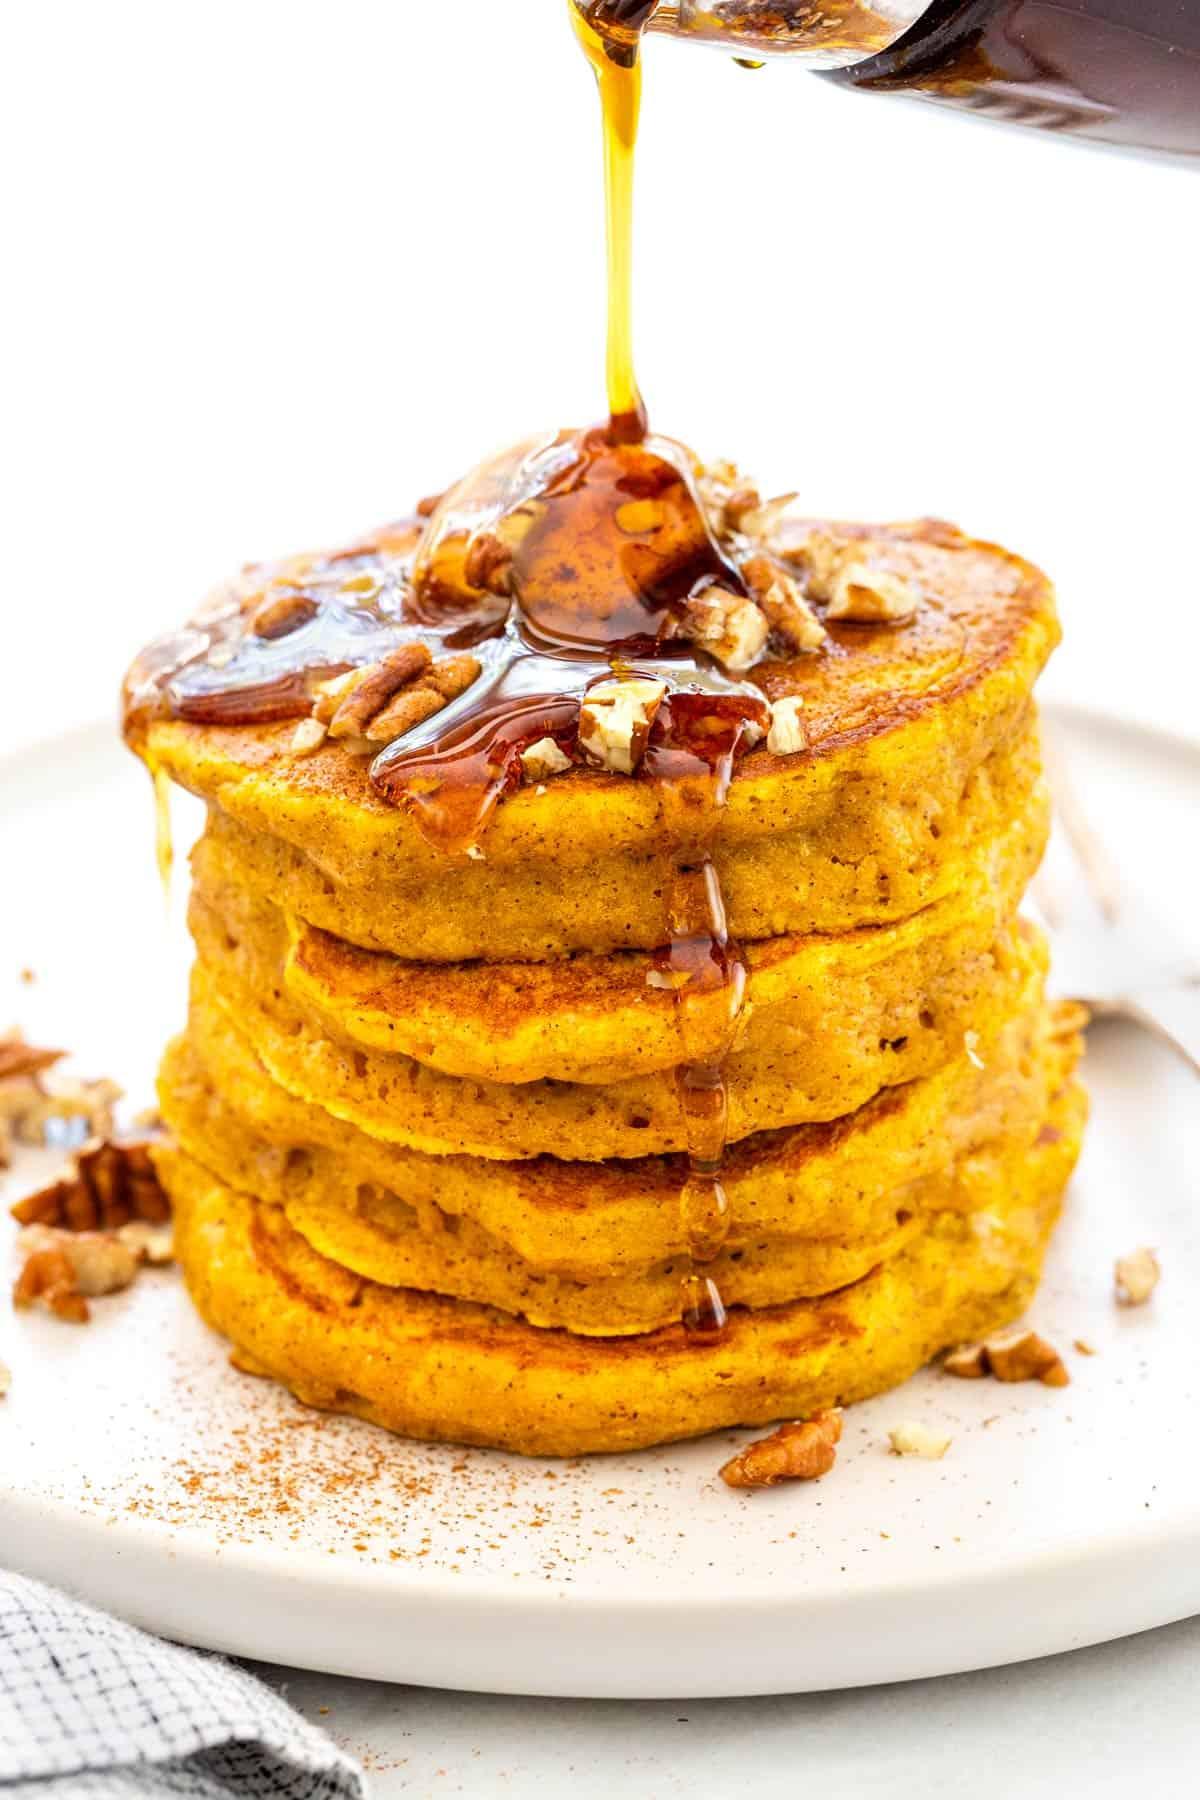 Light and fluffy pumpkin pancakes mixed with a warm blend spices. Using pumpkin puree keeps each cake tender and adds a festive orange hue. #pumpkinpancakes #pancakes #breakfast #pumpkinrecipes